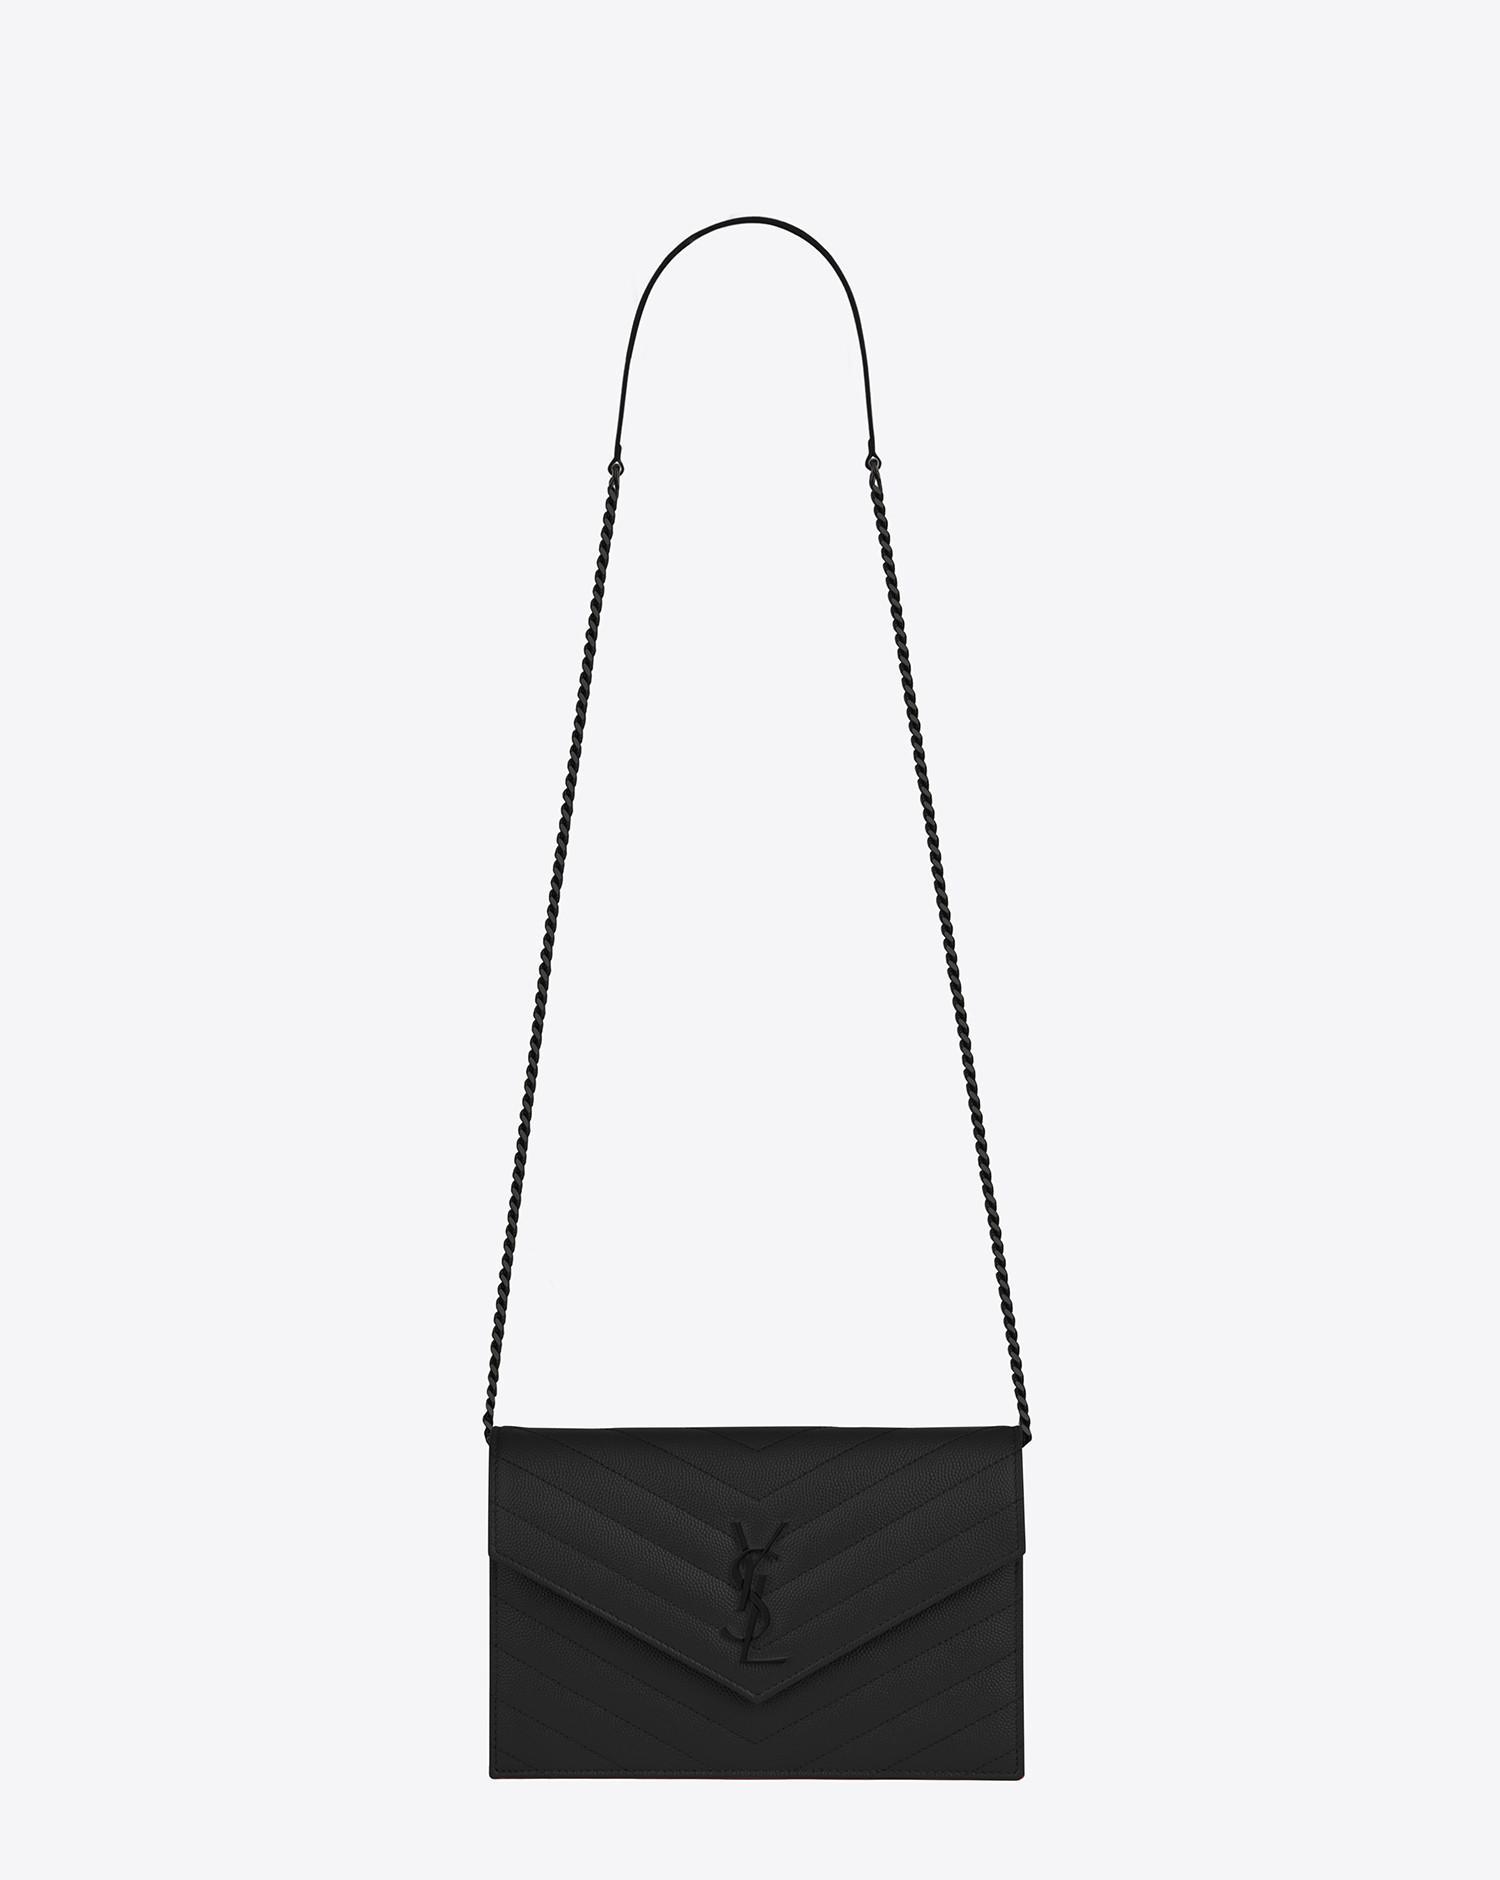 2dbf16e5a42 Saint Laurent Black Envelope Chain Wallet In Grain De Poudre Embossed  Leather. View fullscreen